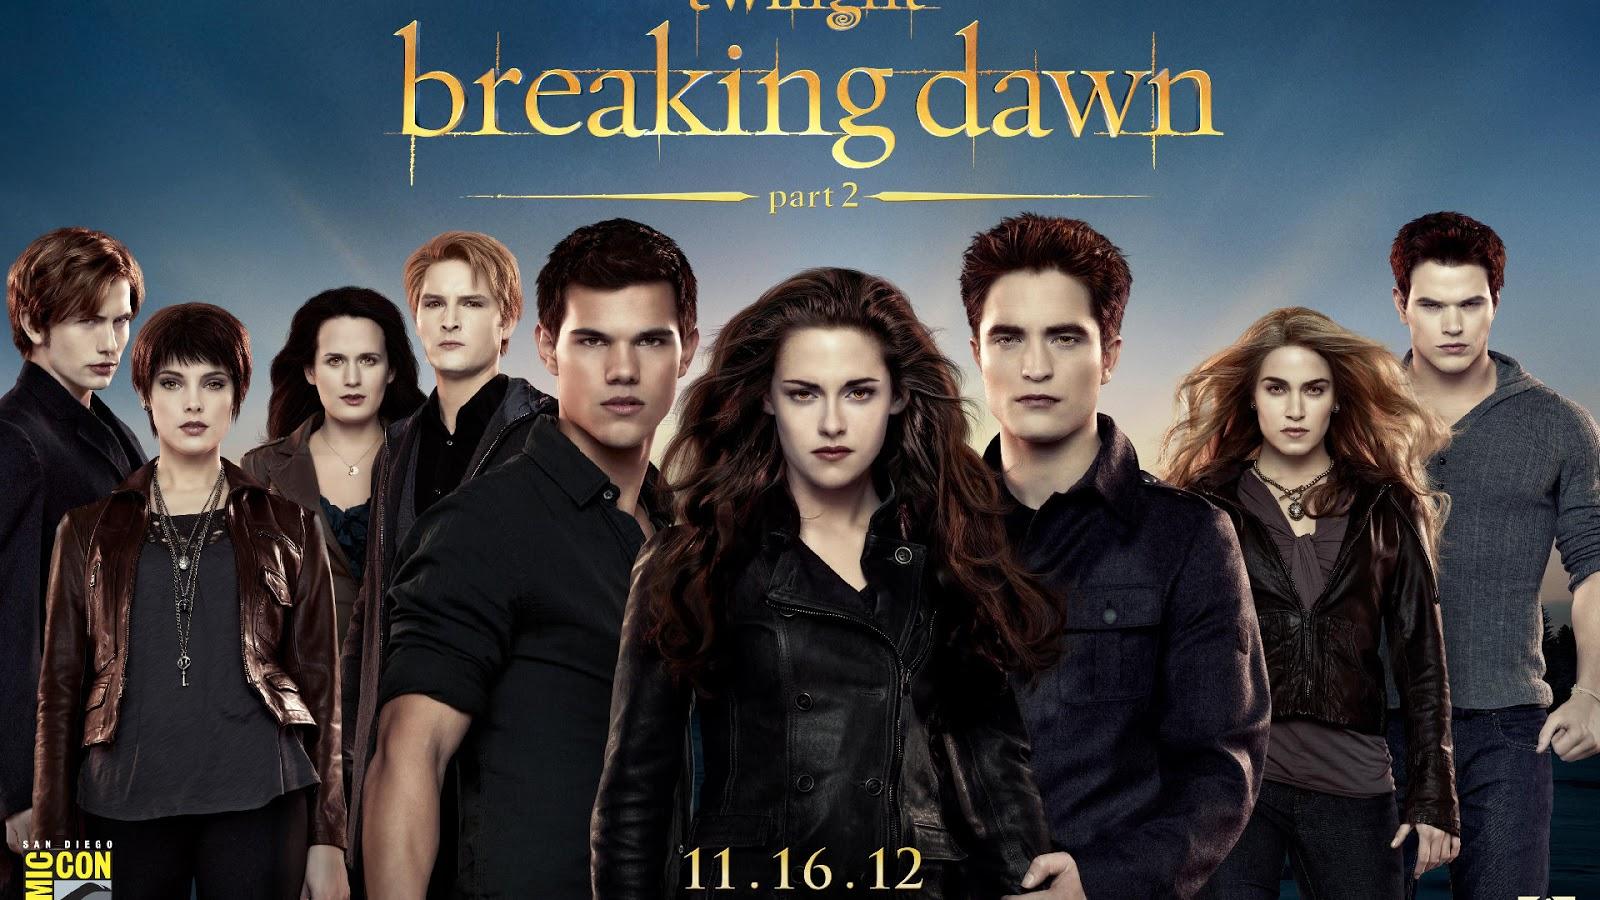 http://2.bp.blogspot.com/-LbNGuyEmJ_g/UKZ7jpGqACI/AAAAAAAAIzA/ai1tz3QXnDs/s1600/twilight+breaking+dawn+part+2+HD+wallpaper+Image6.jpg